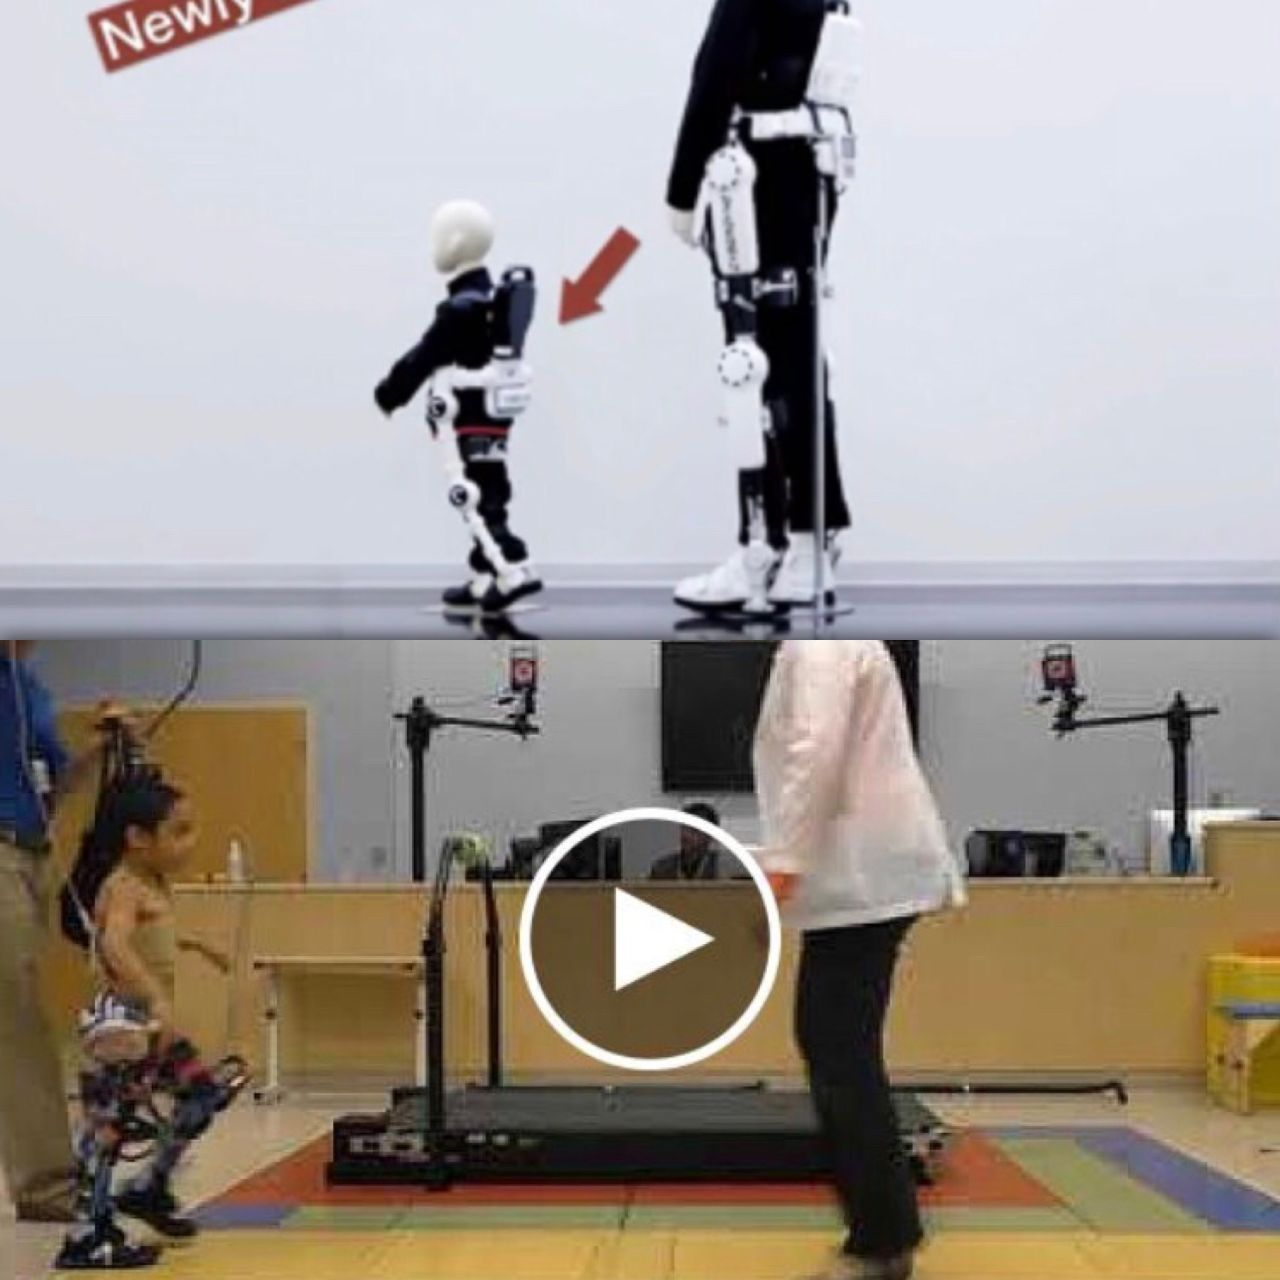 7779 - CYBERDYNE(株) アメリカ国立衛生研究所(NIH)は小児脳性麻痺患者用exoskeletonの研究を進めており、9月1